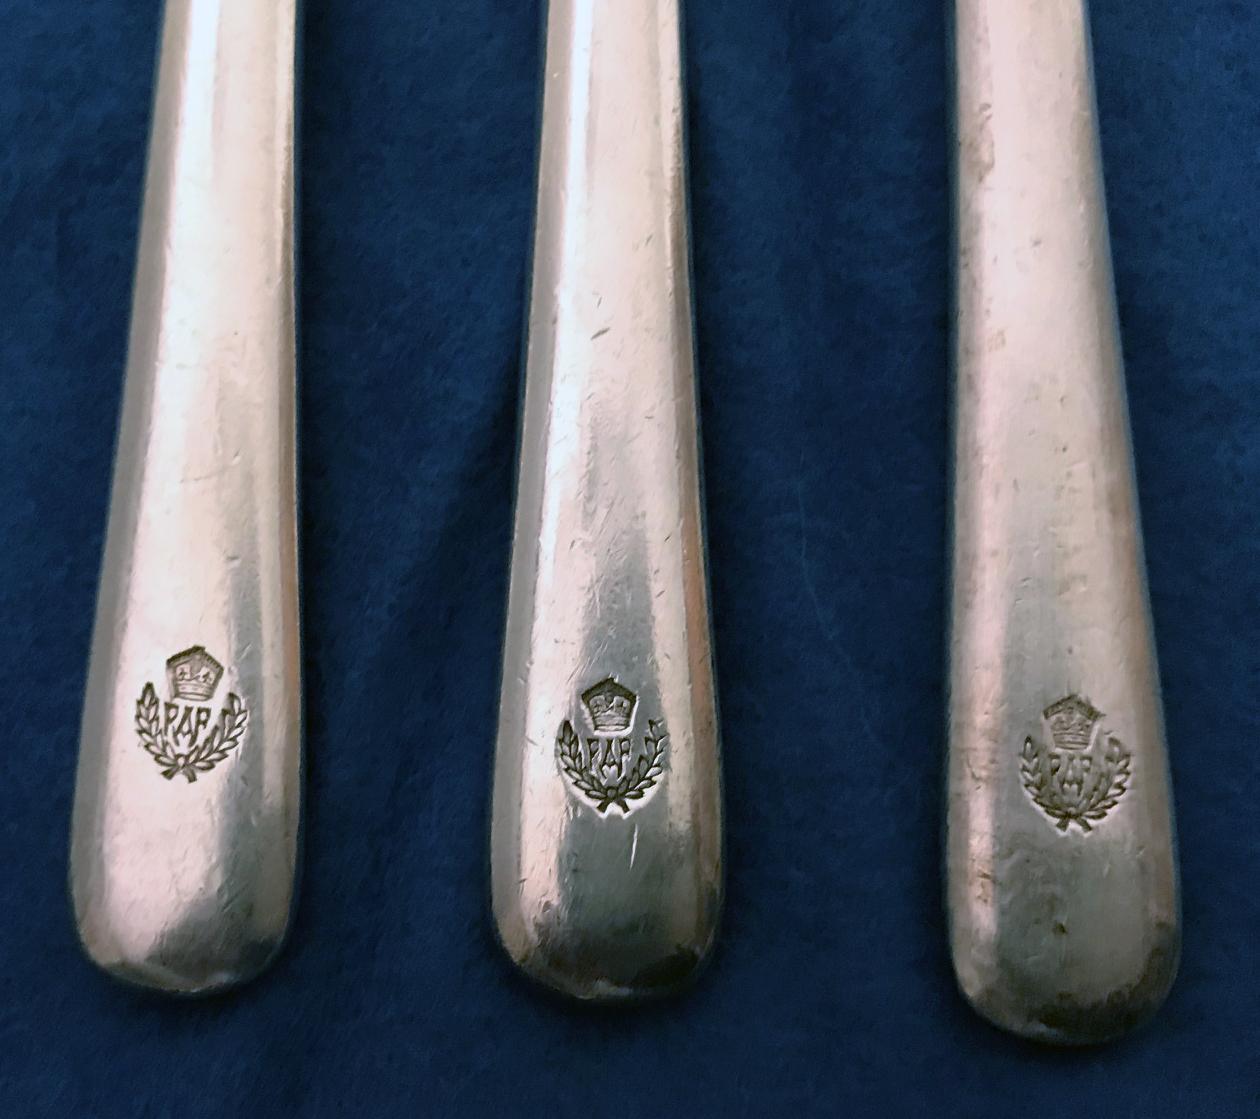 RAF Cocktail Forks - Hallam Plate